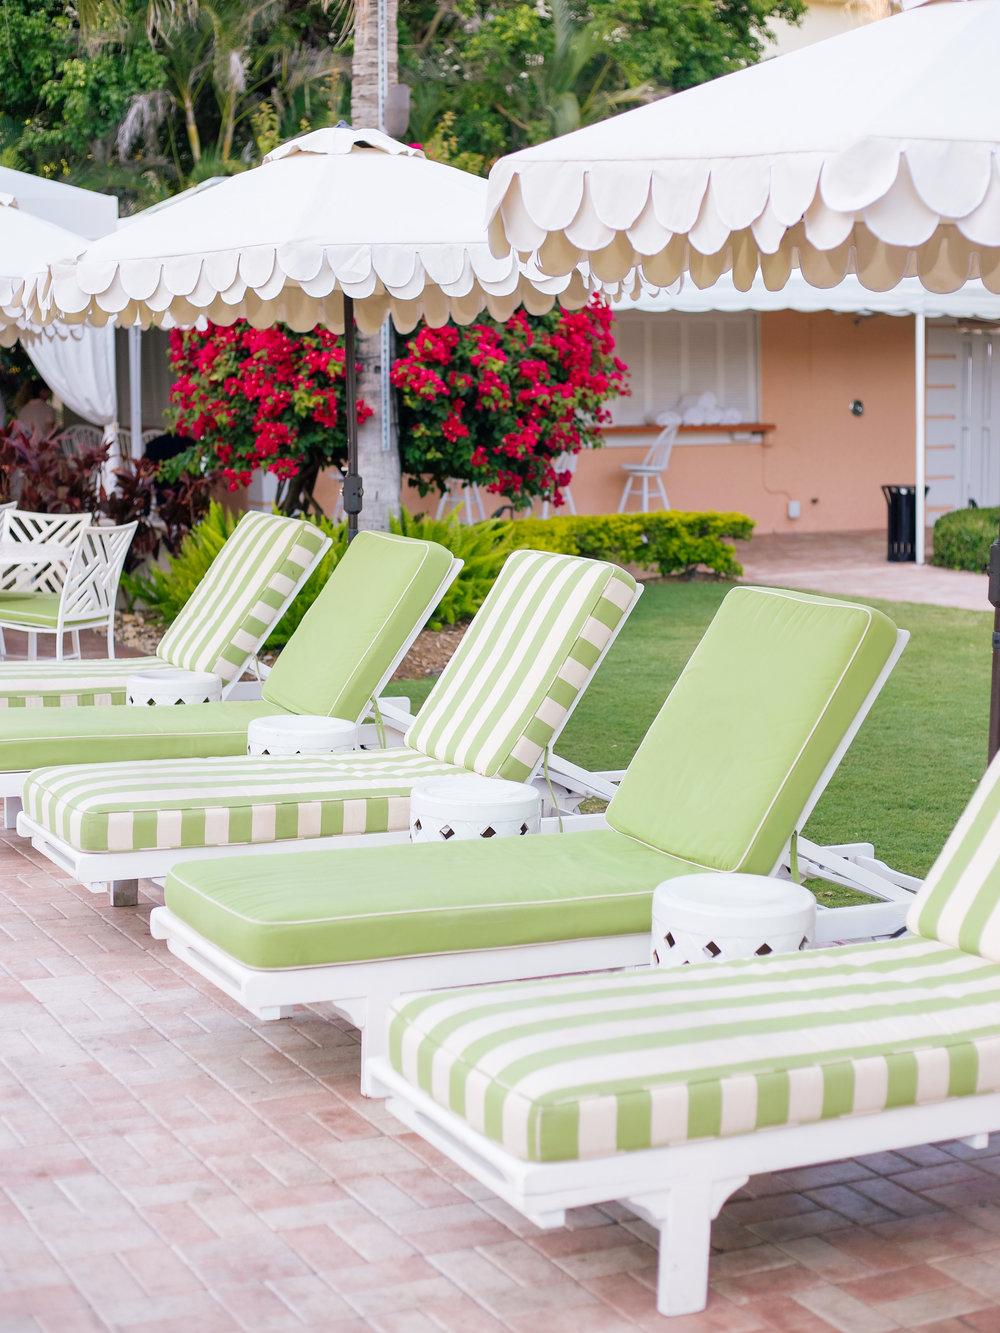 LCB STYLE FASHION BLOGGER COLONY HOTEL PALM BEACH-2.jpg